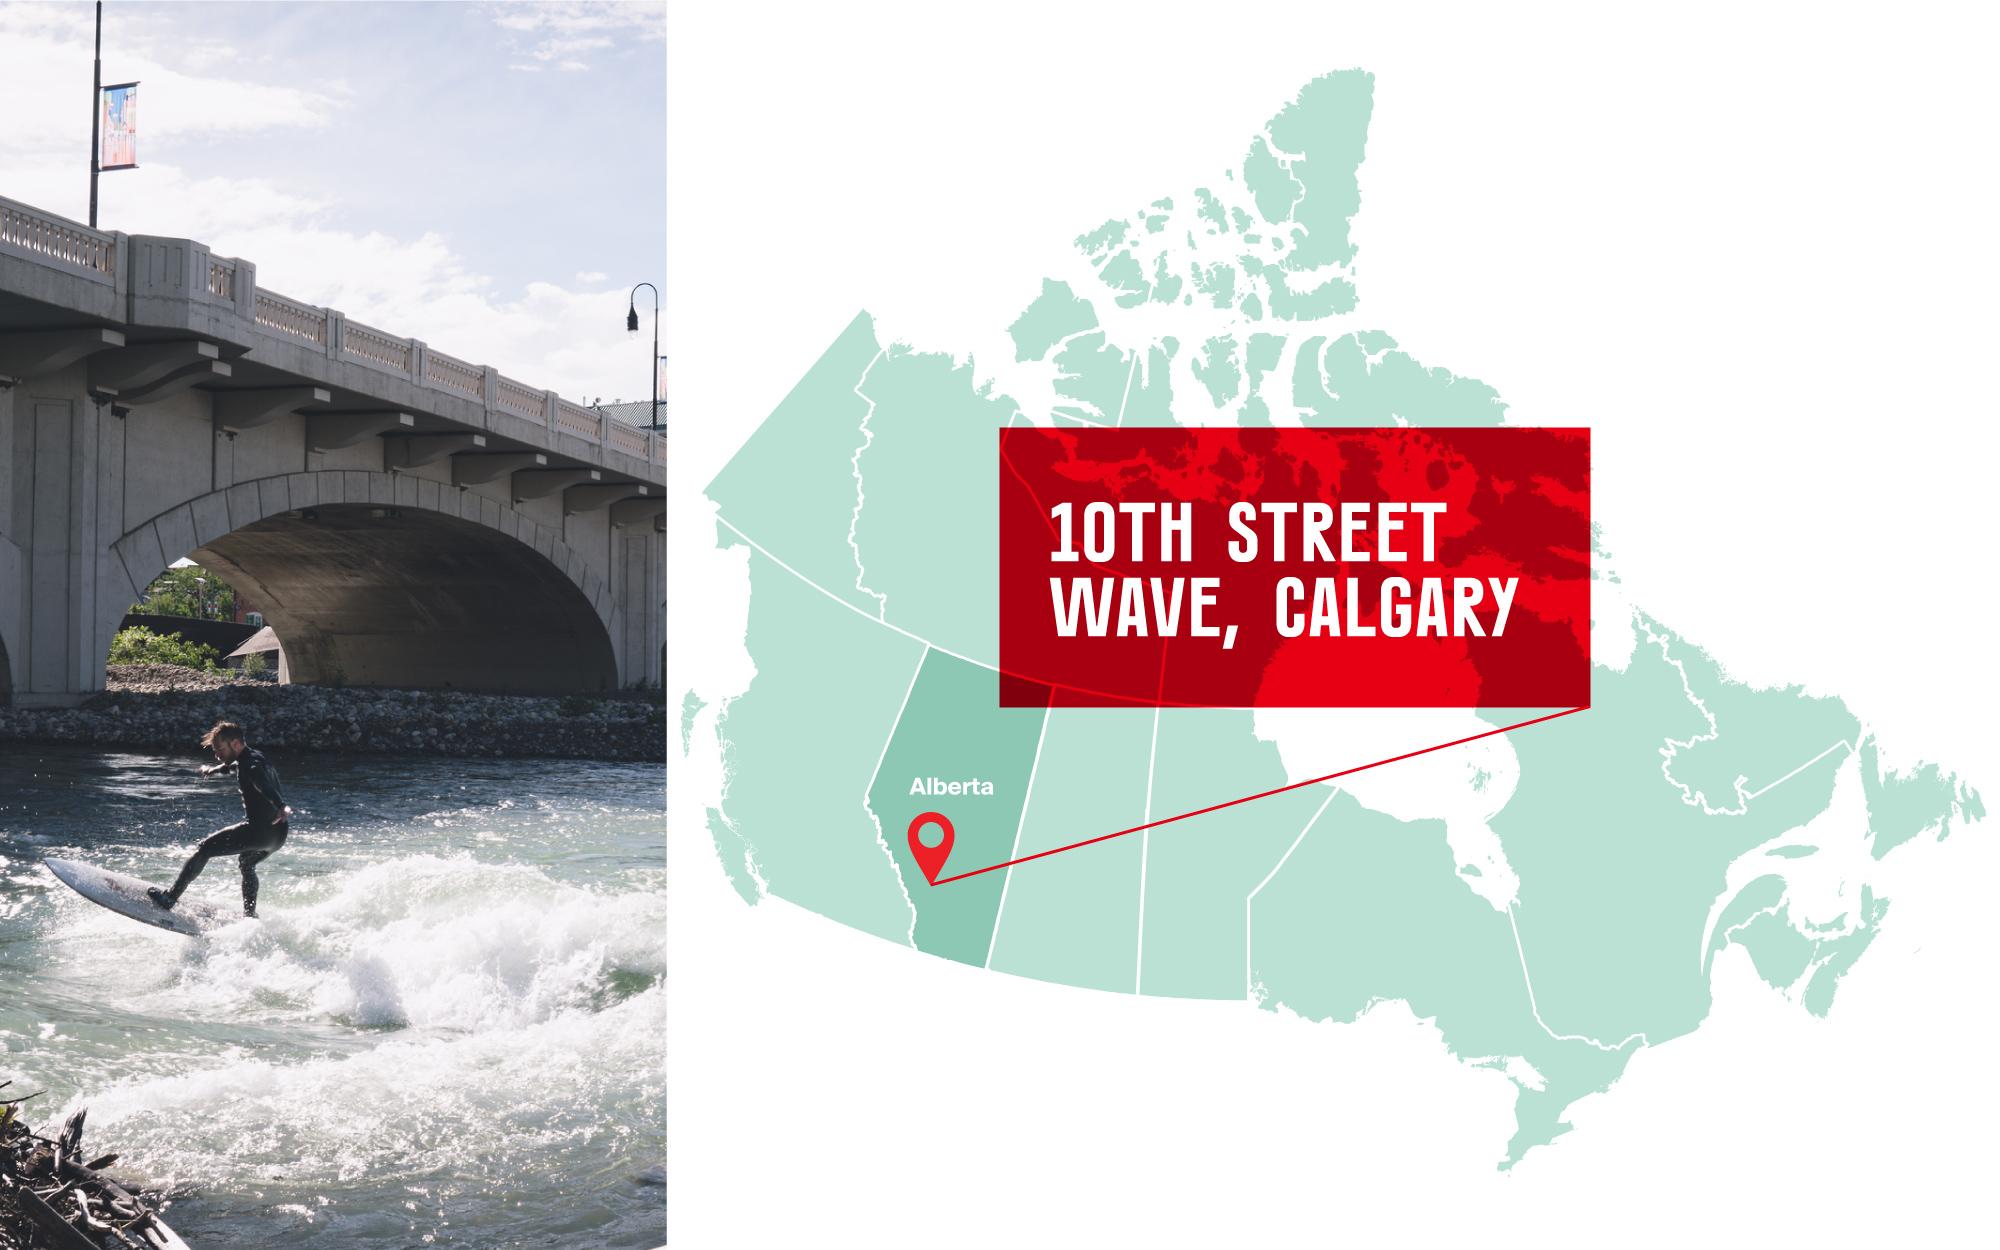 Person surfing under a bridge in Calgary